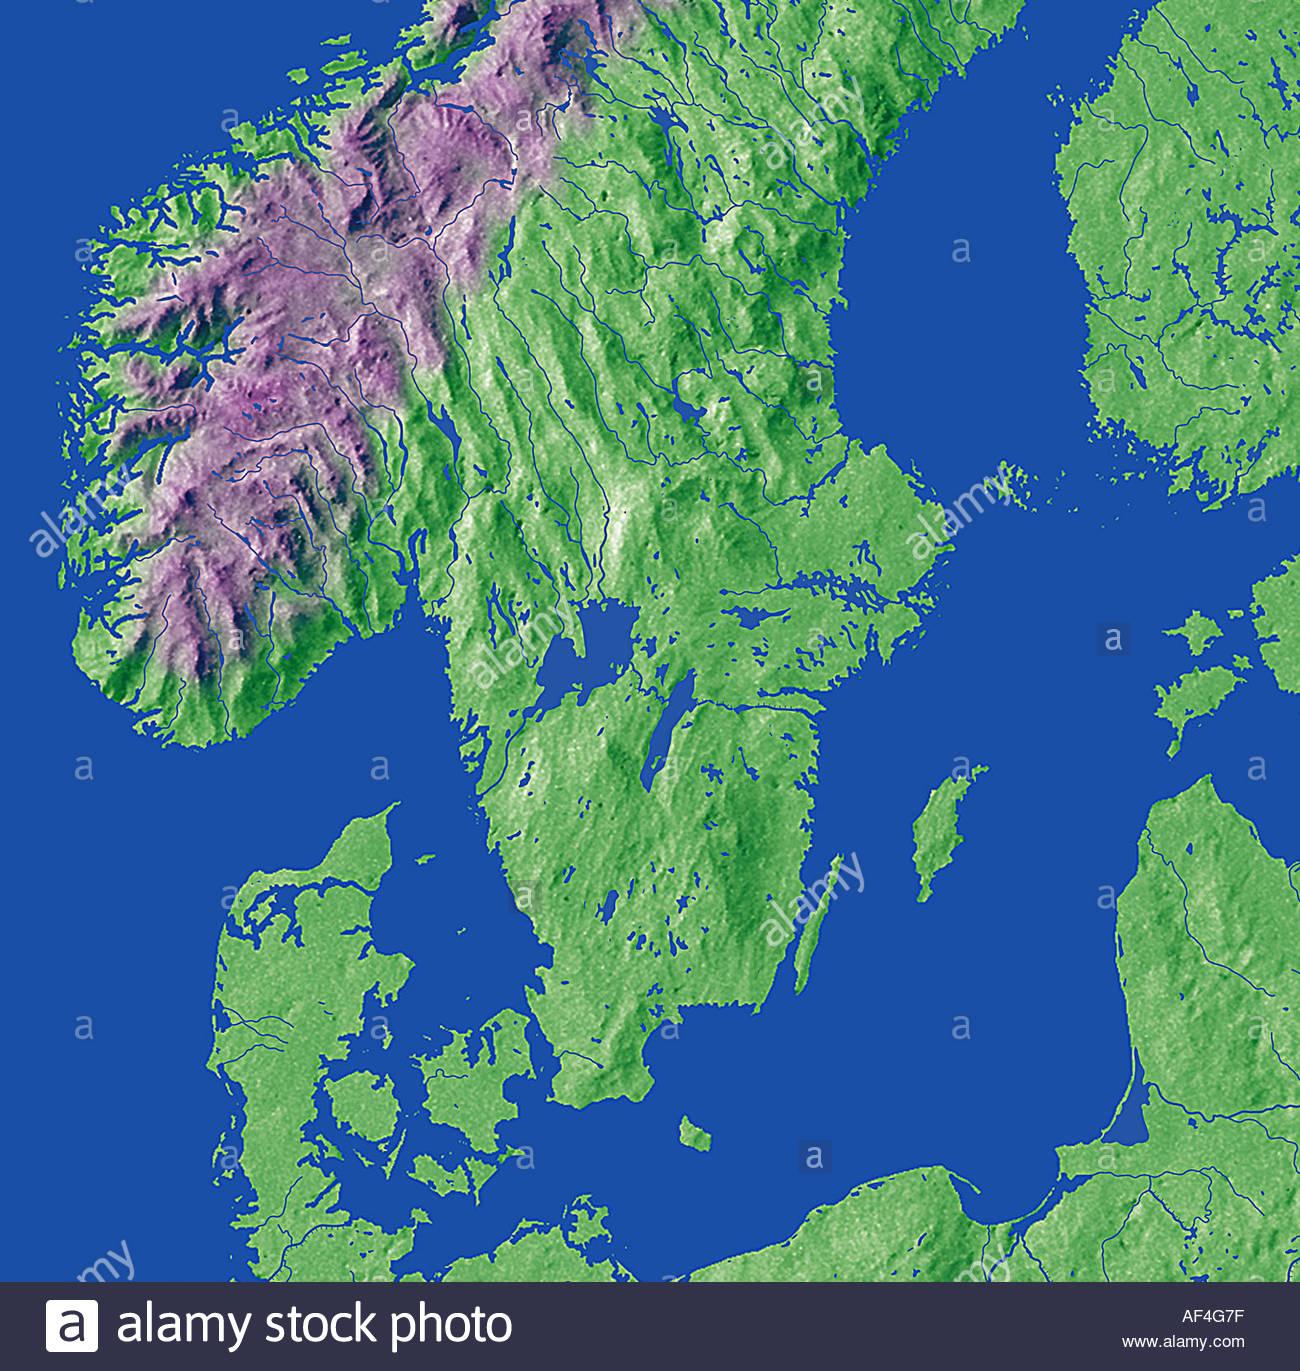 Map Maps Globe Globes Europe Skandinavia Denmark Sweden Norway - Norway map on globe